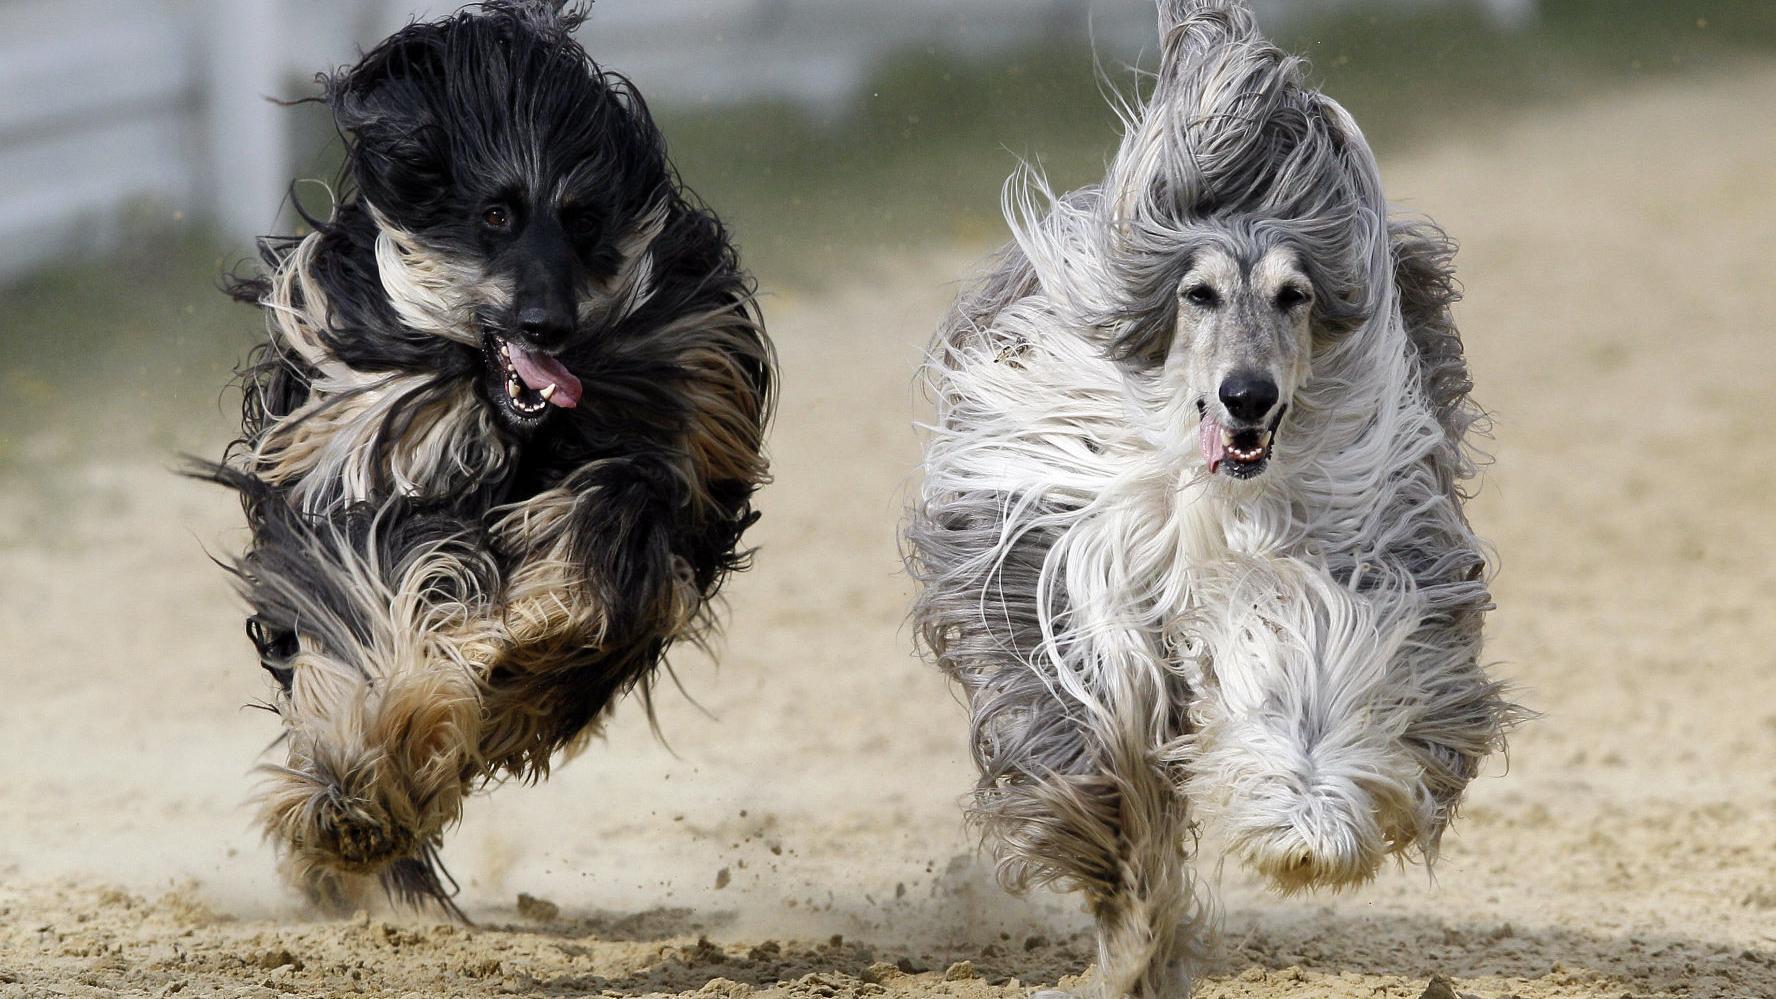 Meet the 19 least intelligent dogs